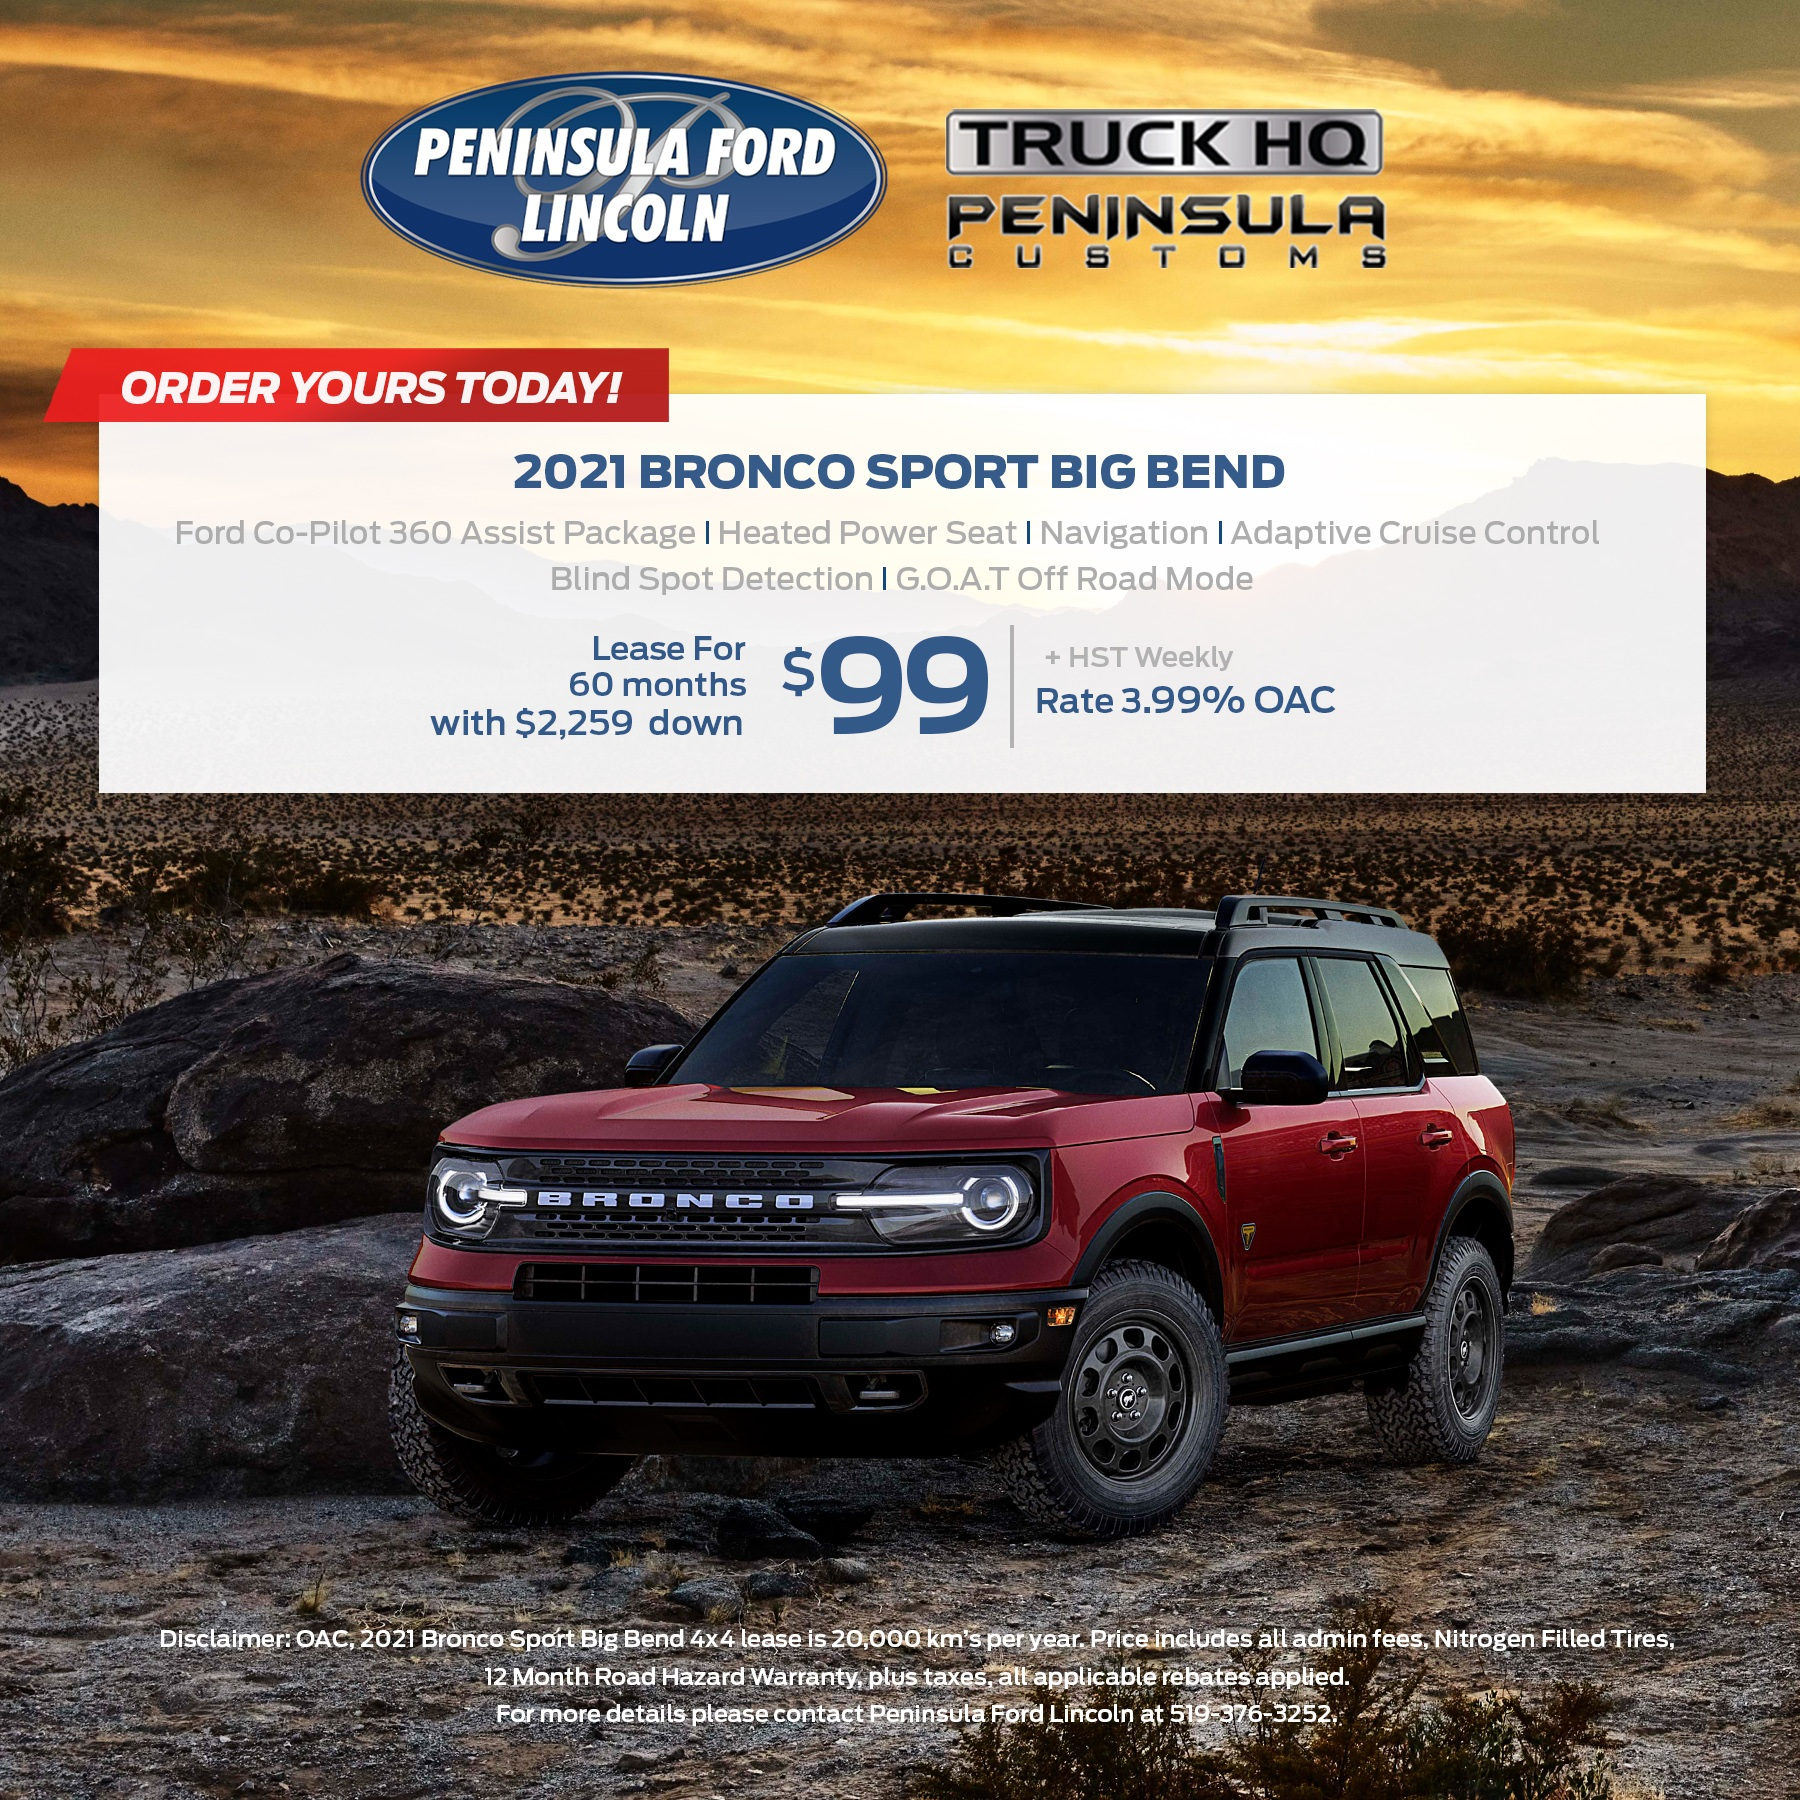 2021 Bronco Sport Big Bend